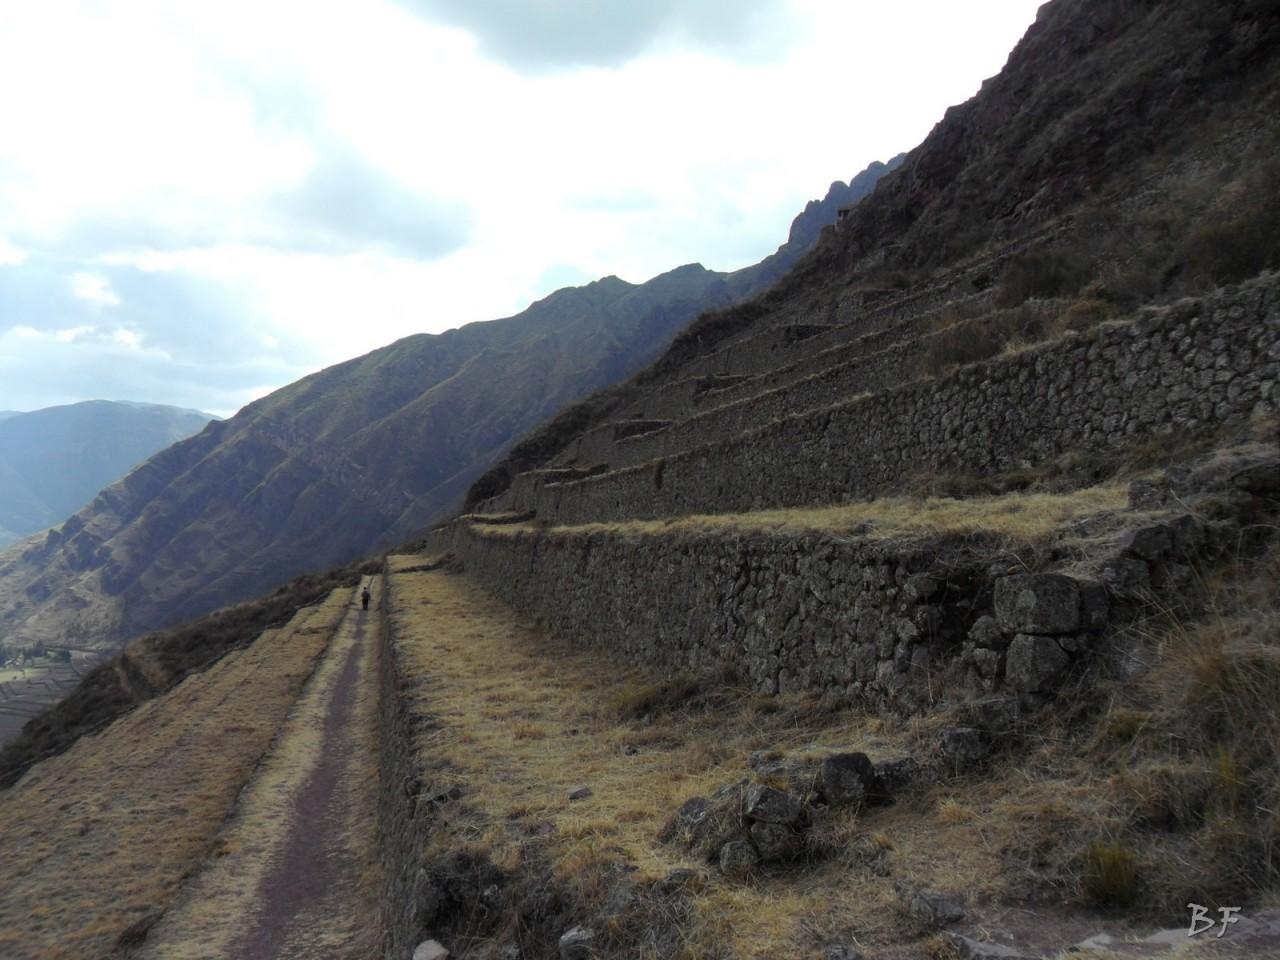 Mura-Poligonali-Megaliti-Altari-Rupestri-Pisac-Cusco-Perù-82